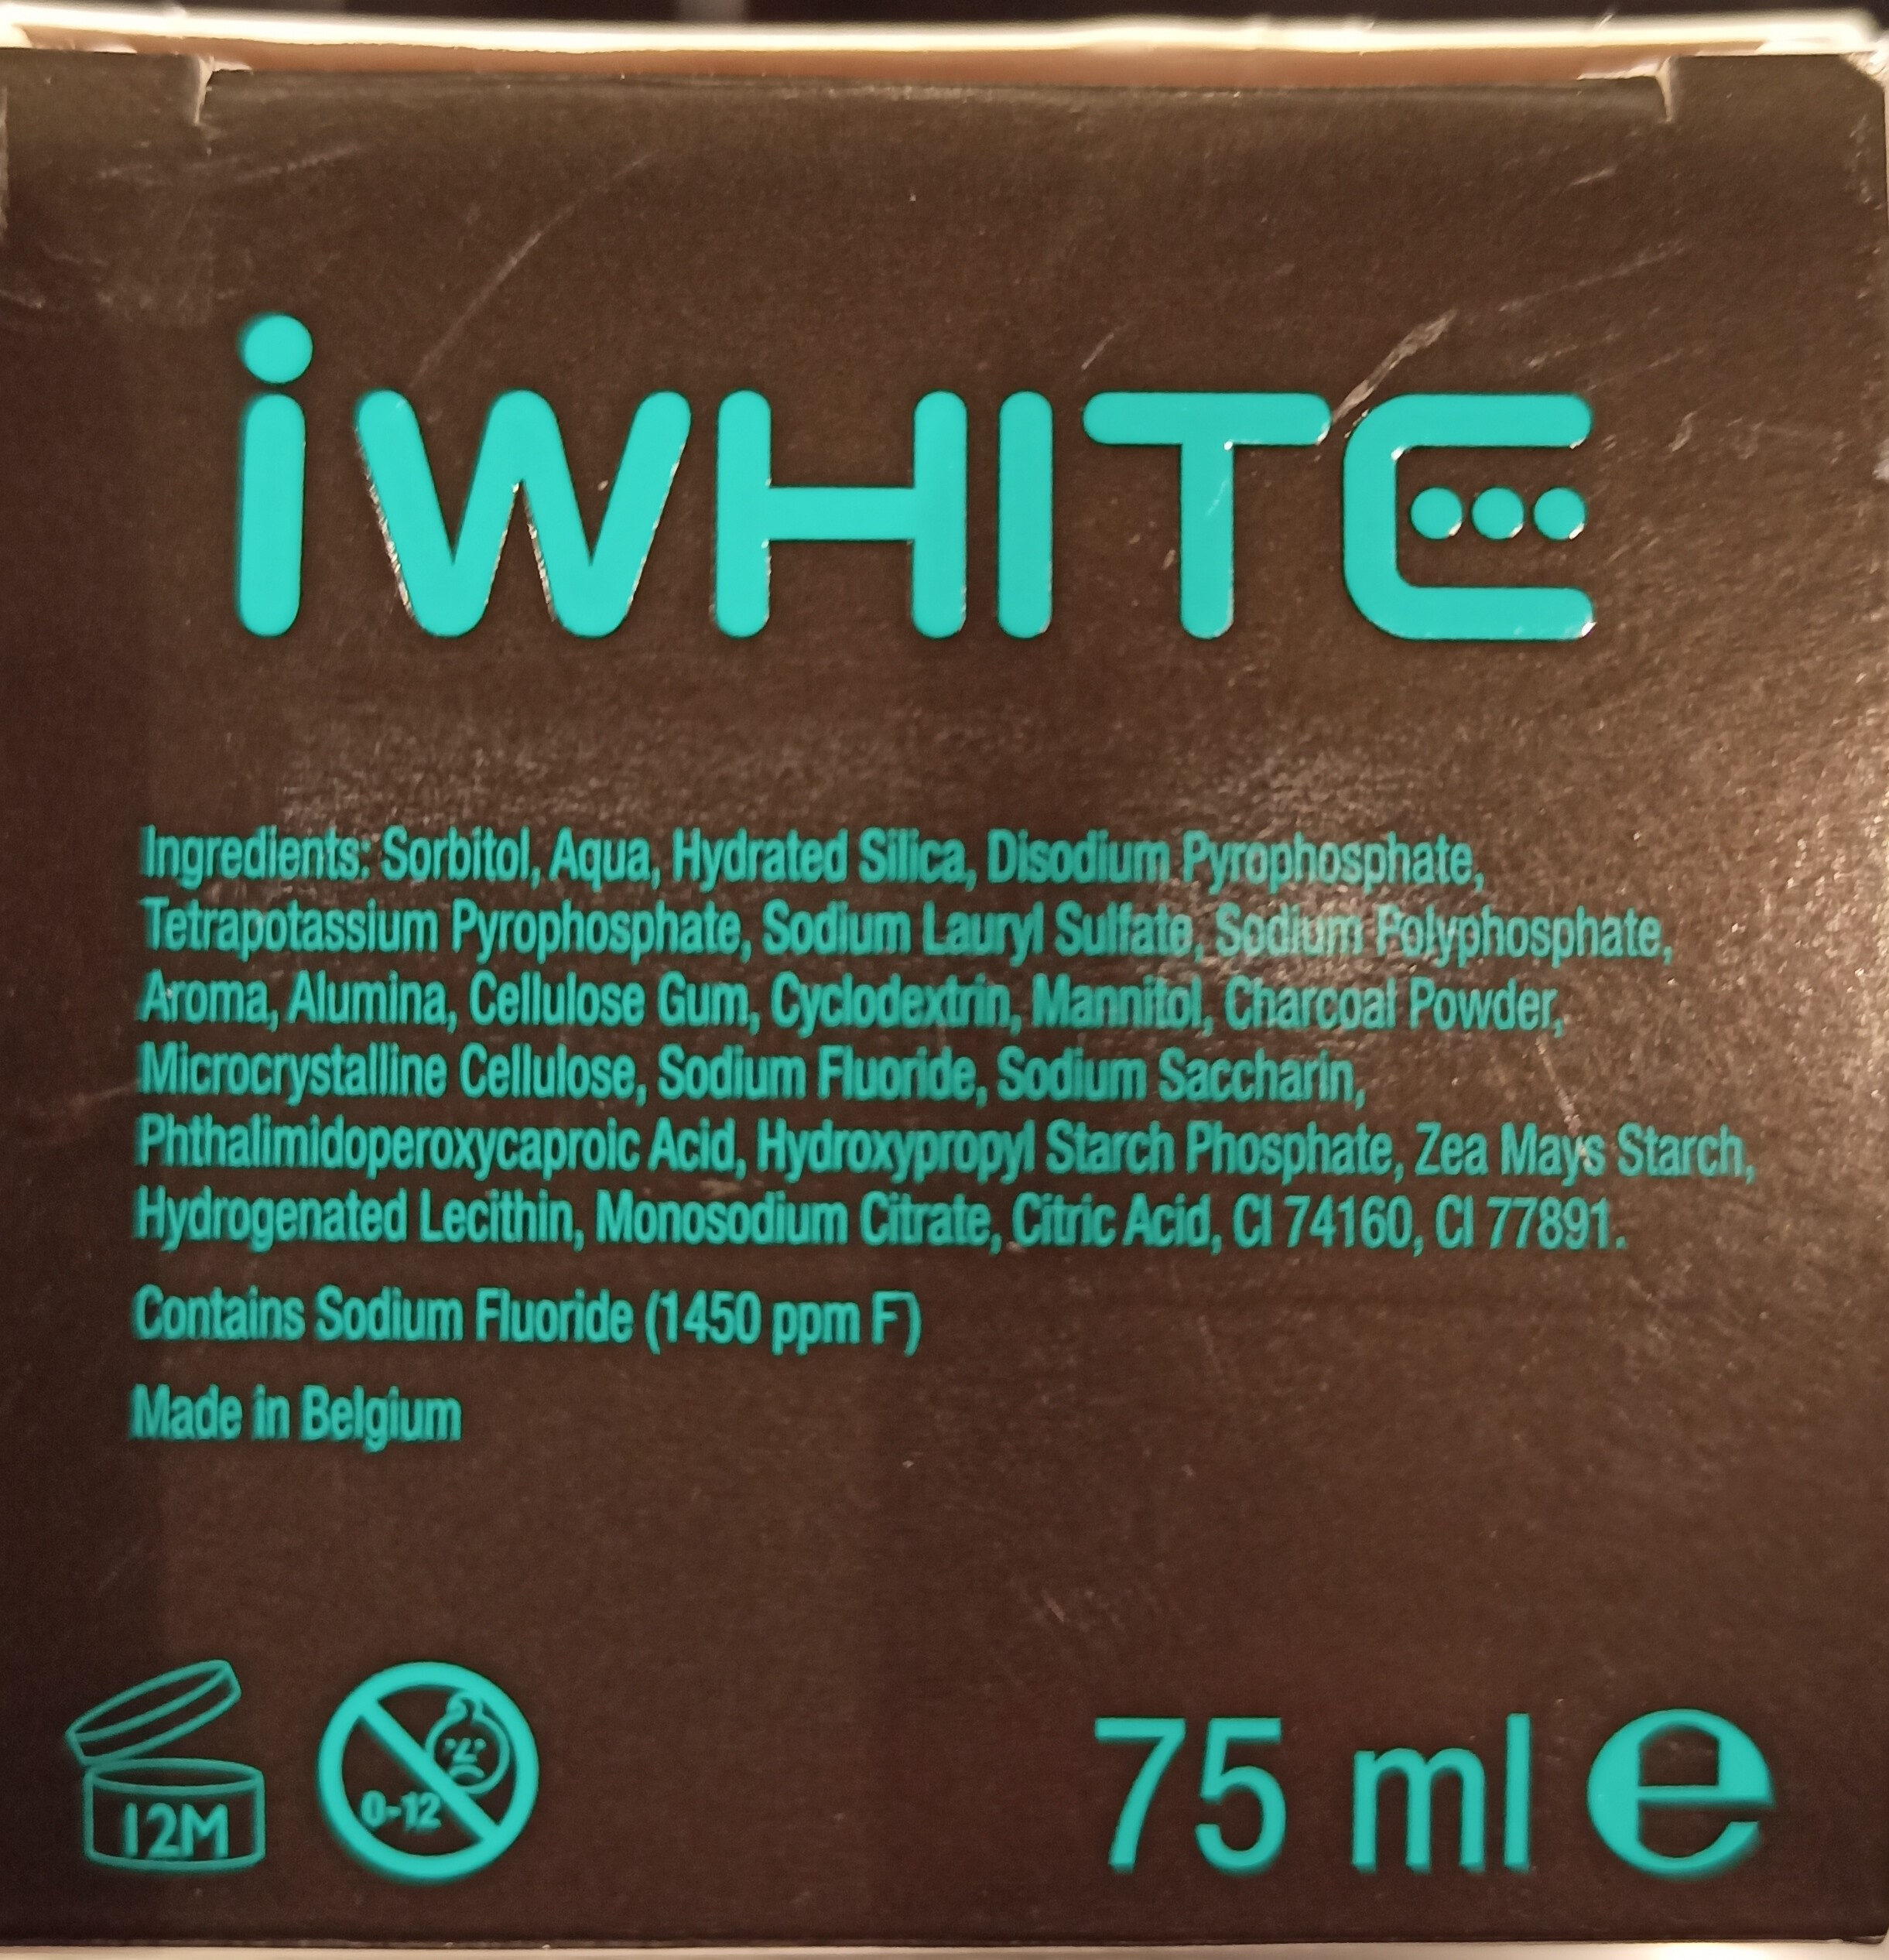 instant teeth whitening - Ingrédients - de